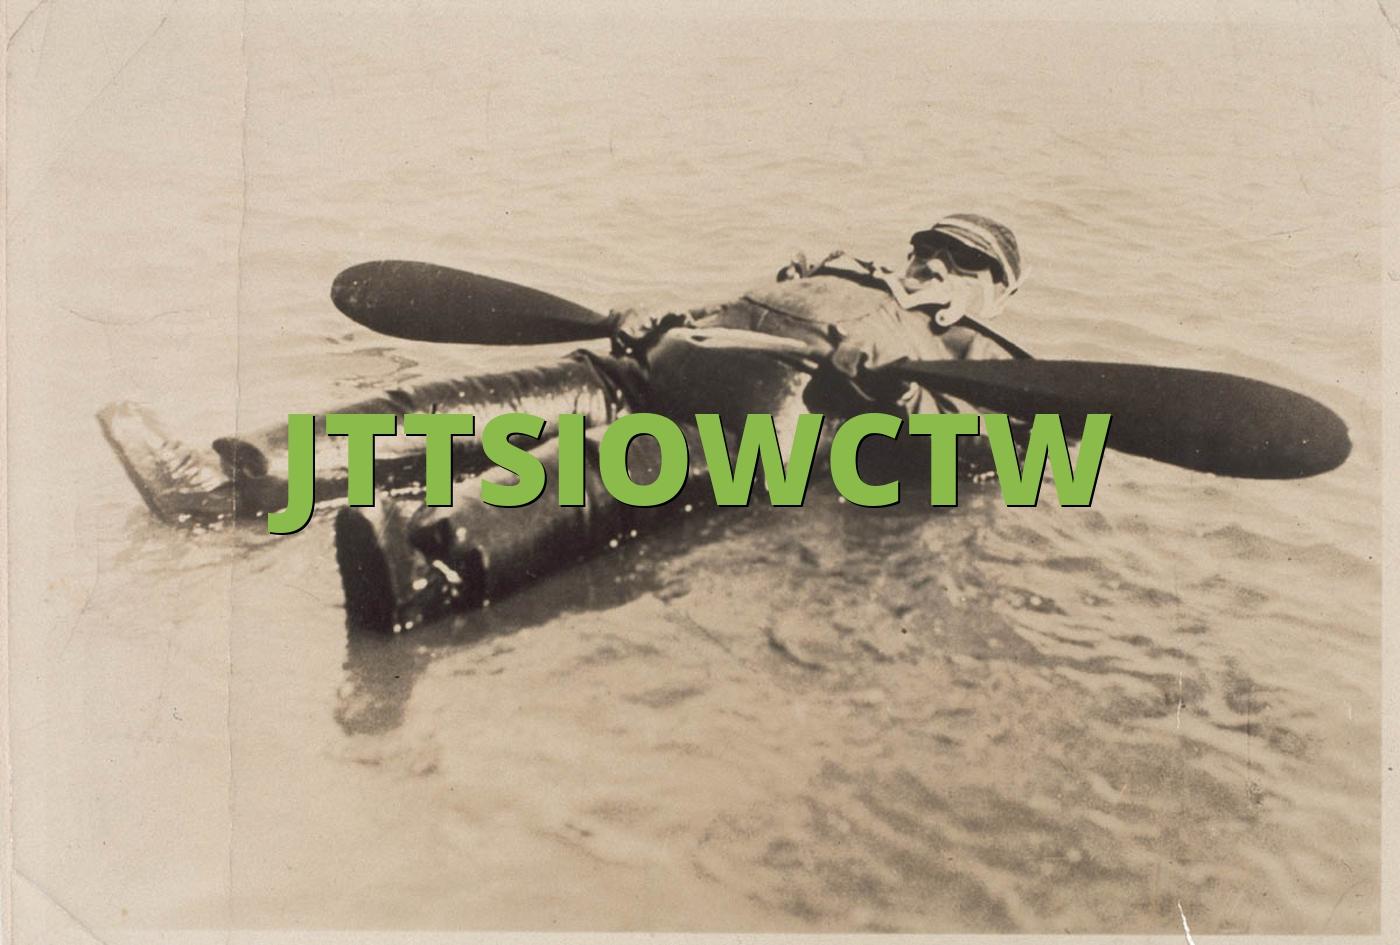 JTTSIOWCTW